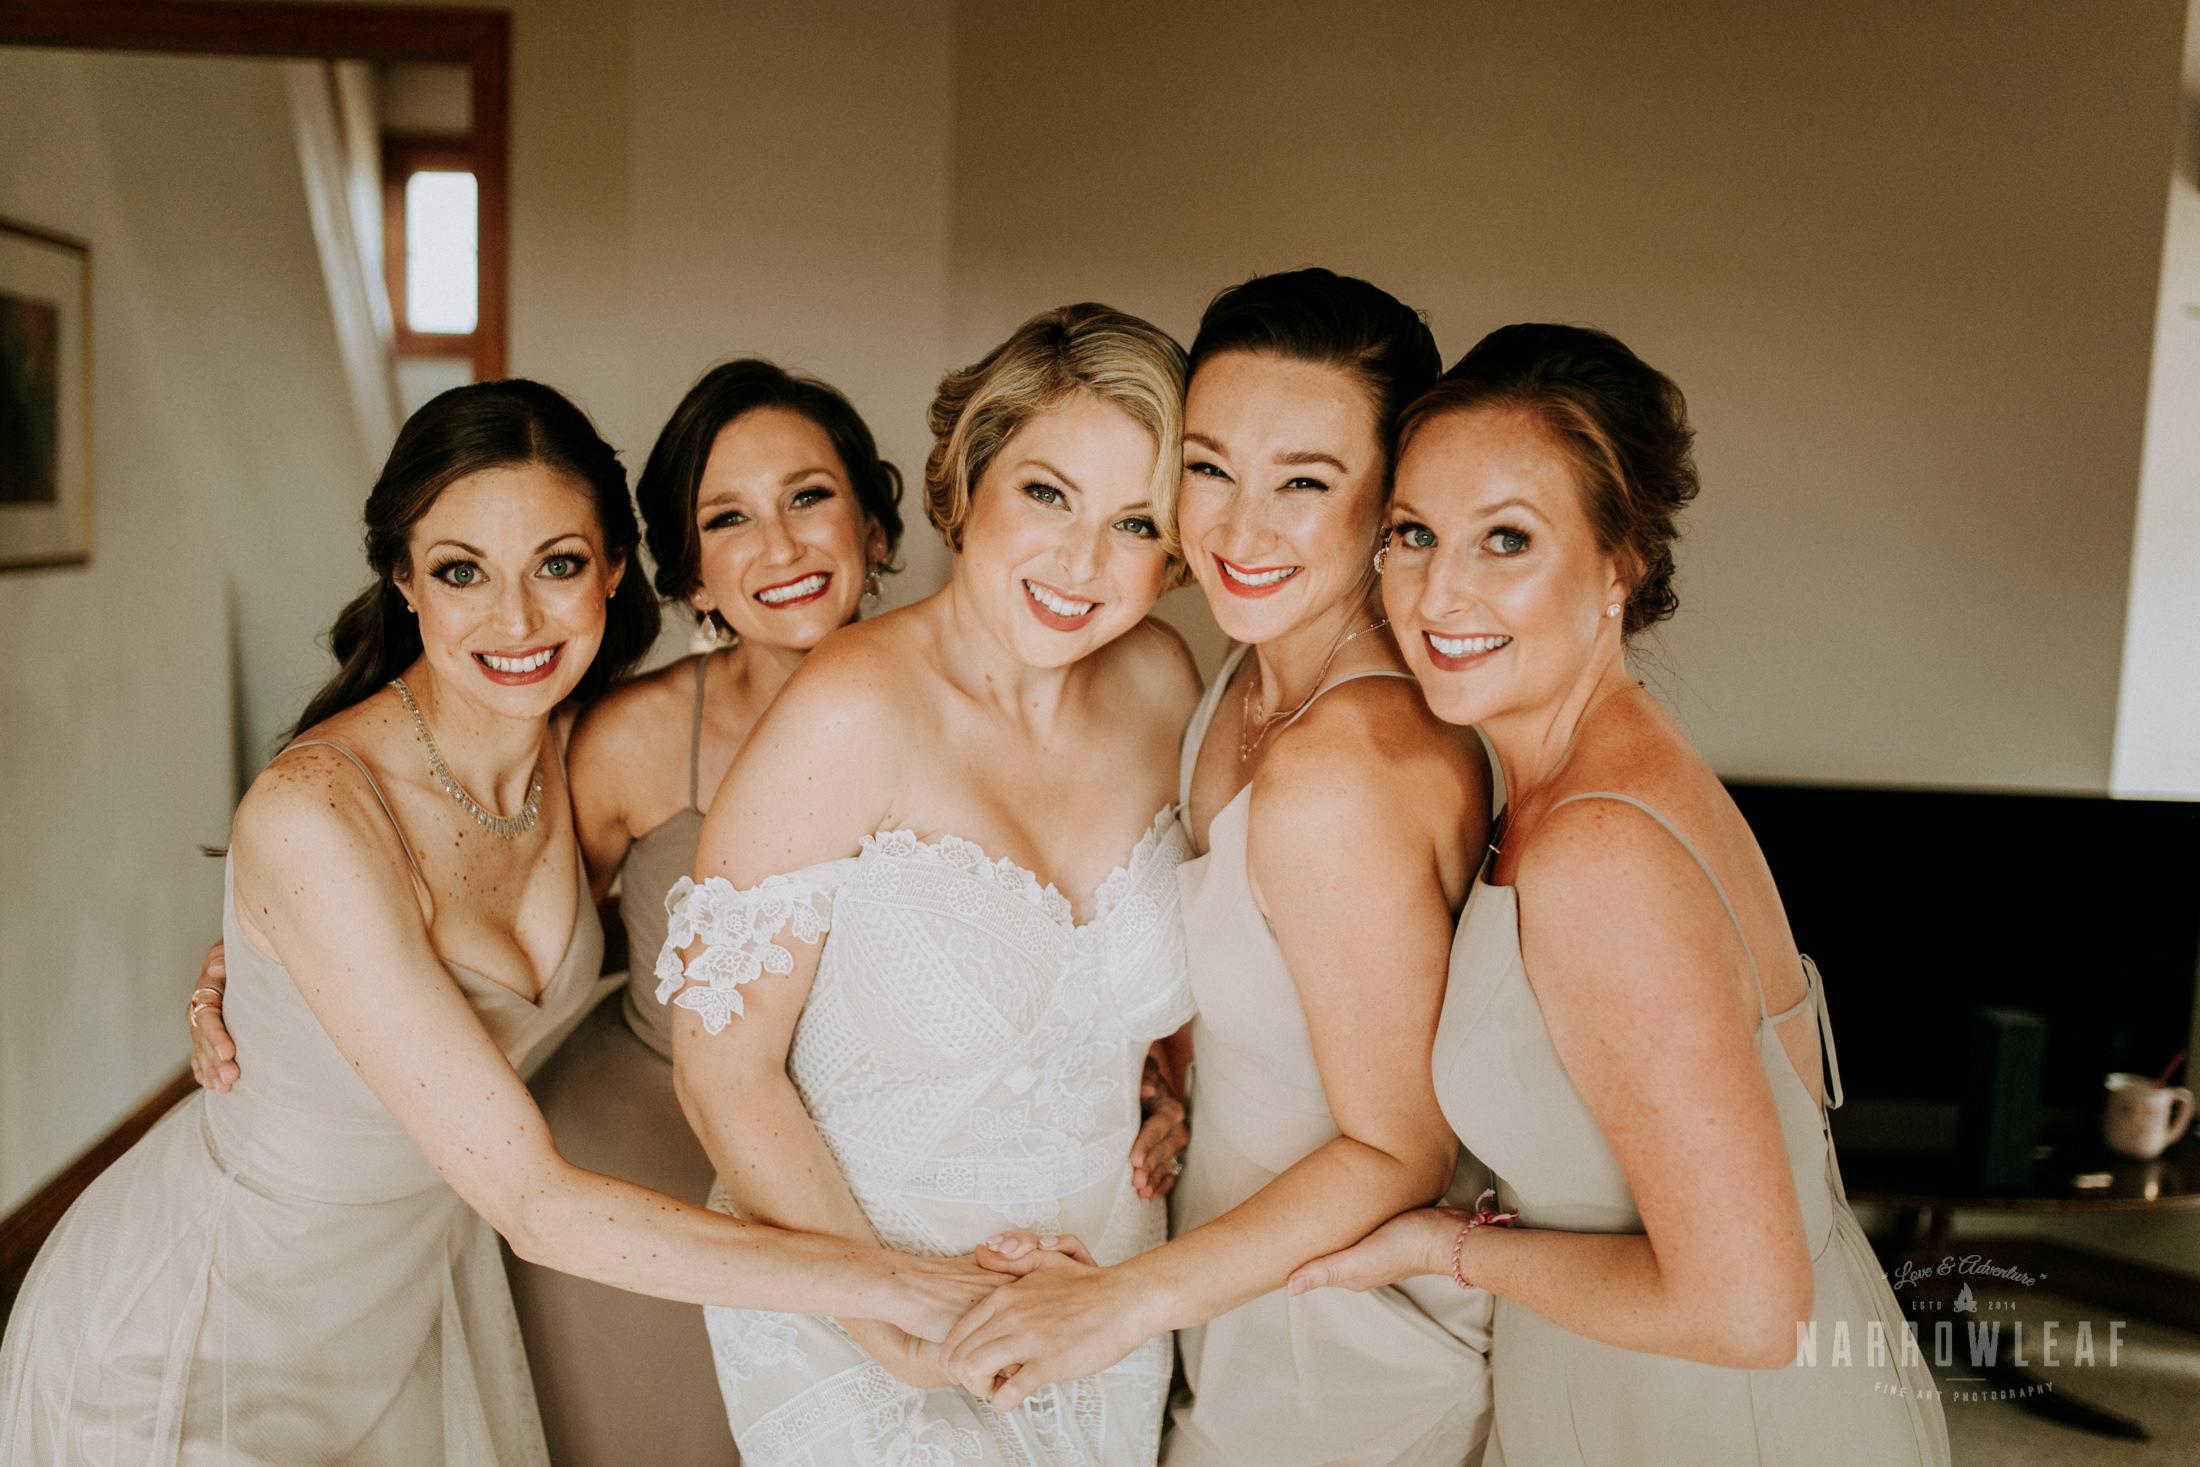 wisconsin-wedding-photographer-Narrowleaf_Love_and_Adventure_Photography-1997.jpg